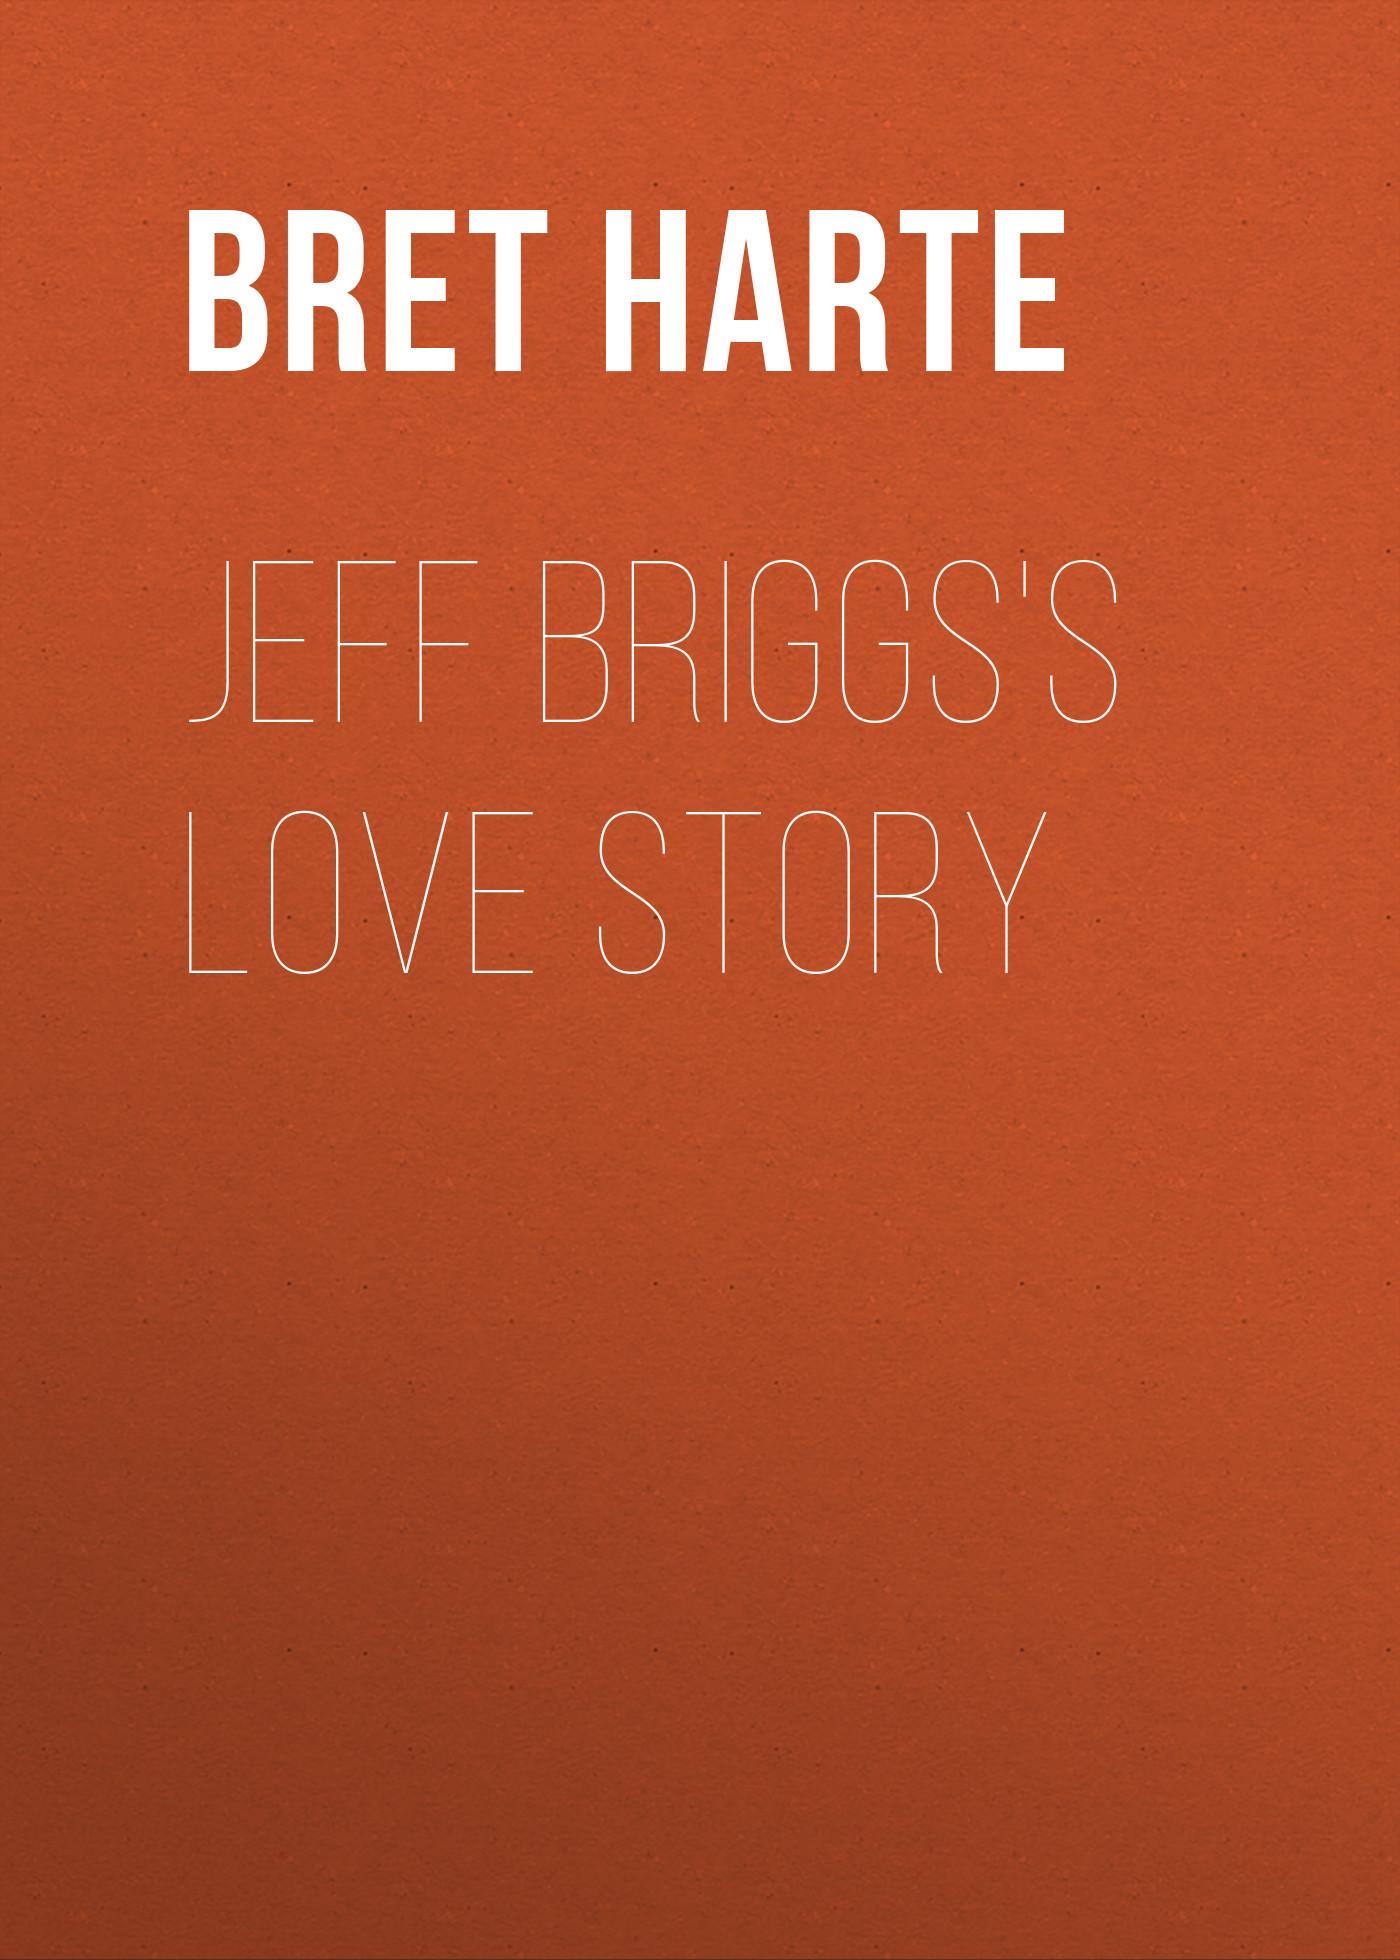 Bret Harte Jeff Briggs's Love Story bret harte novels and stories of bret harte volume 8